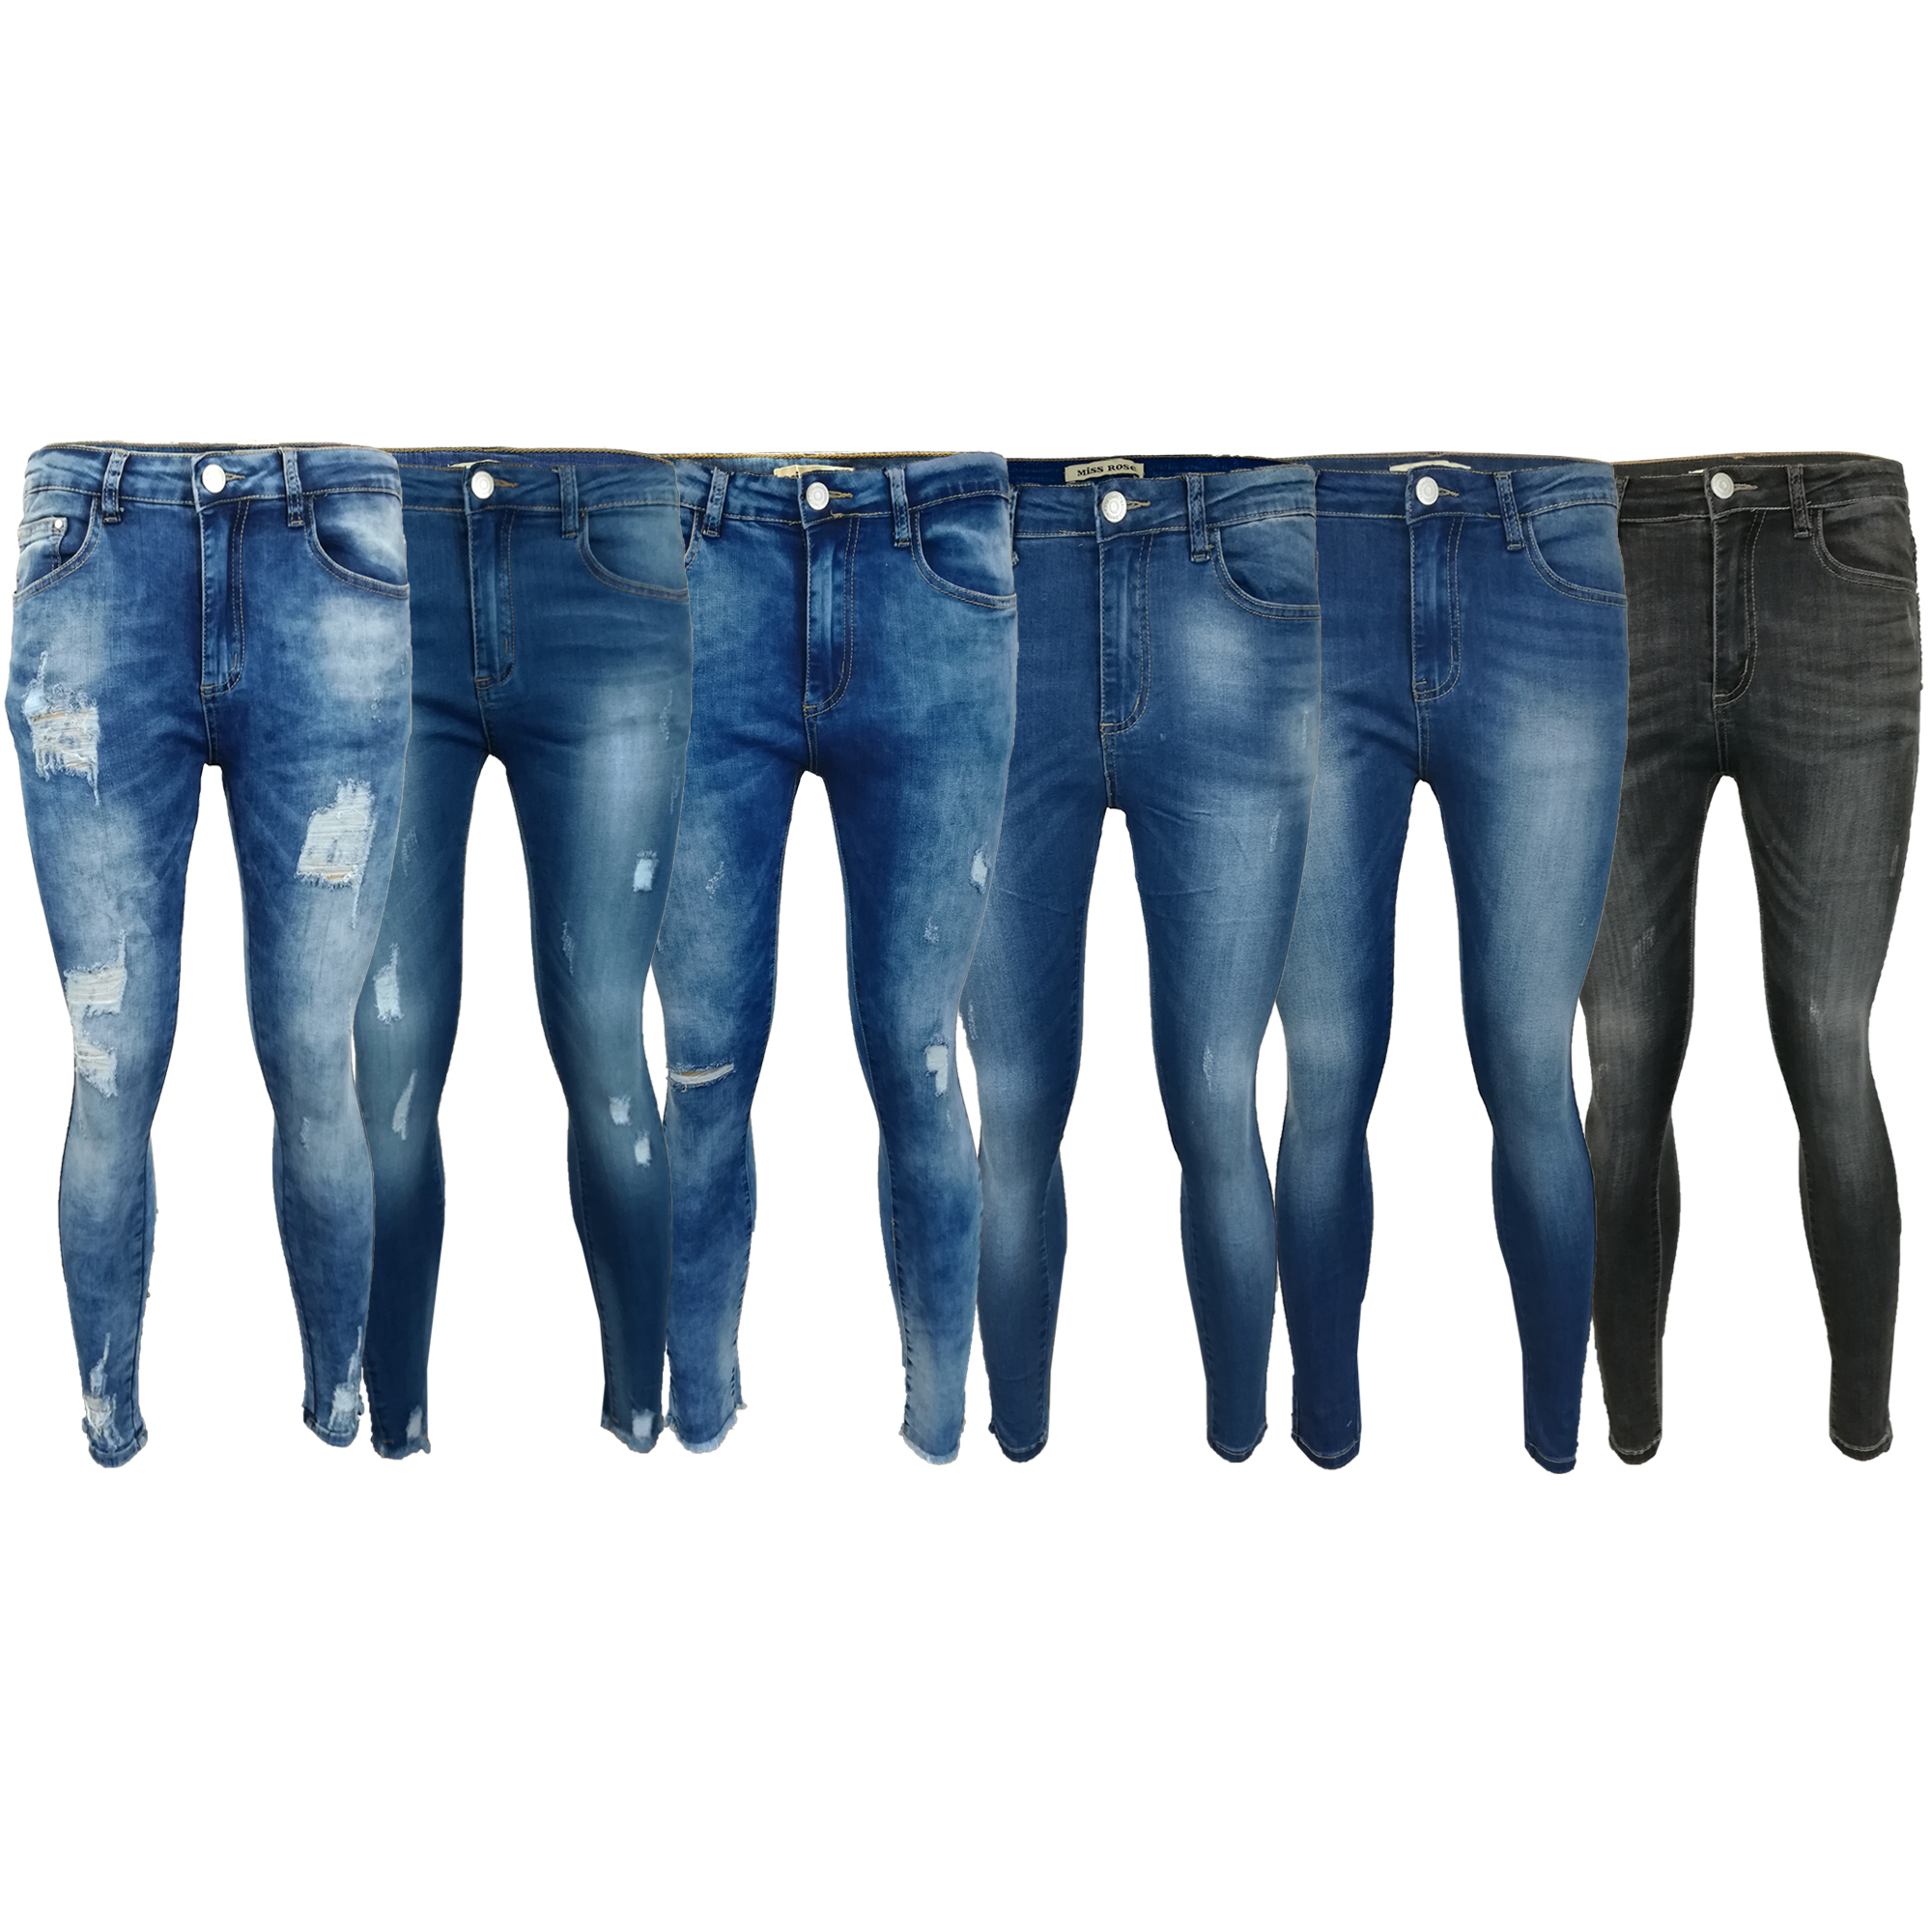 65ac98e61de Ladies Ripped Denim Jeans Womens Skinny Slim Fit Pants Trousers ...